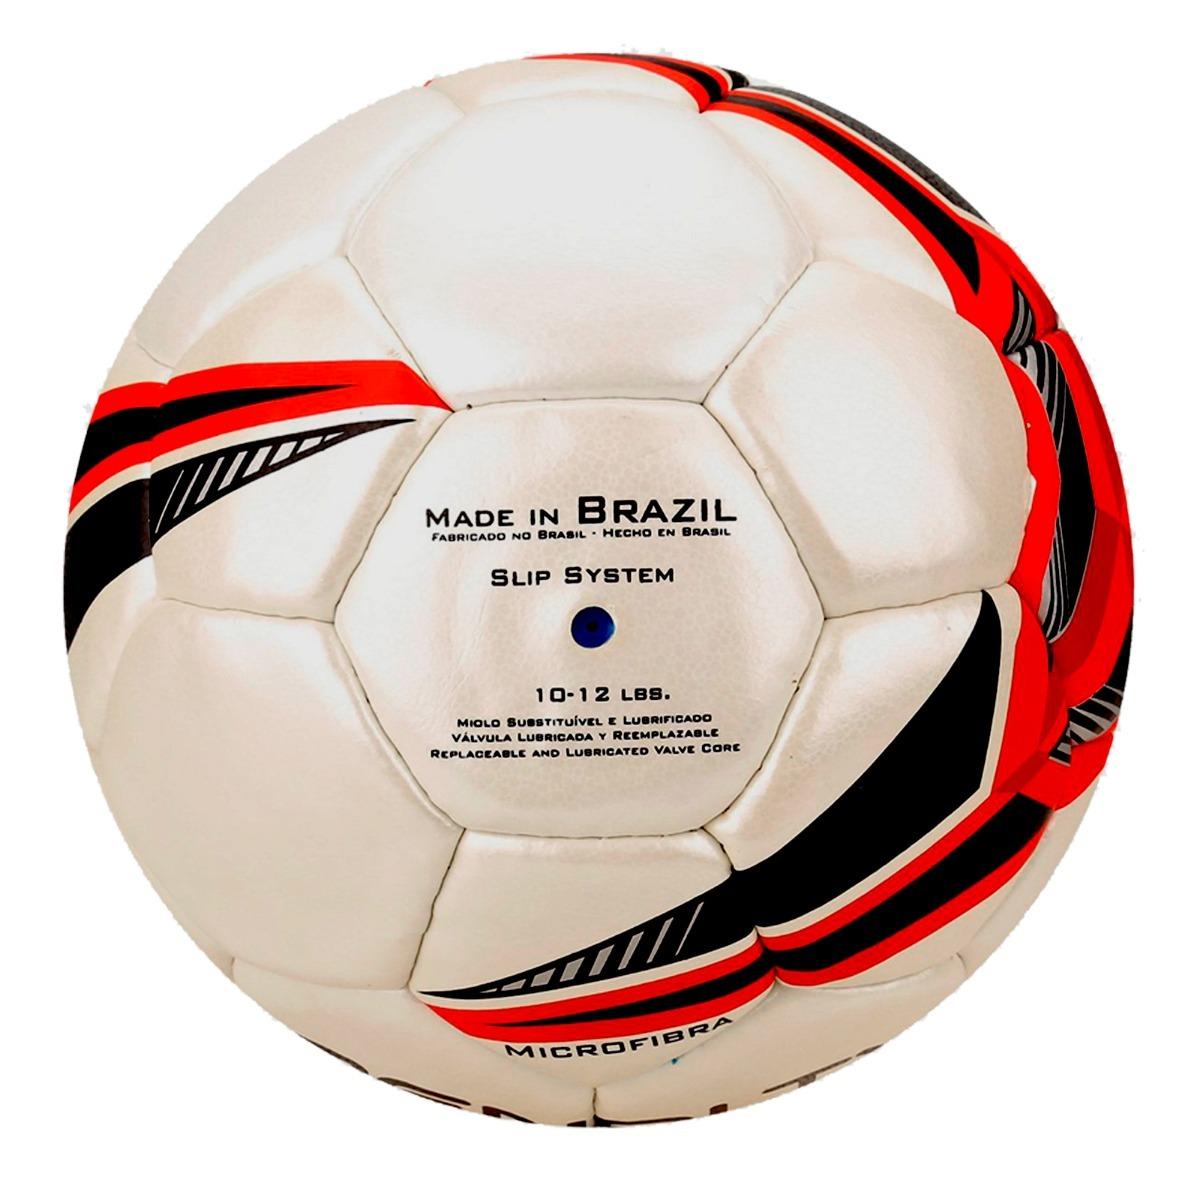 Pelota Futbol N5 Penalty 70 Pro Campo Futbol 11 Profesional ... 7bfa78852d2a4